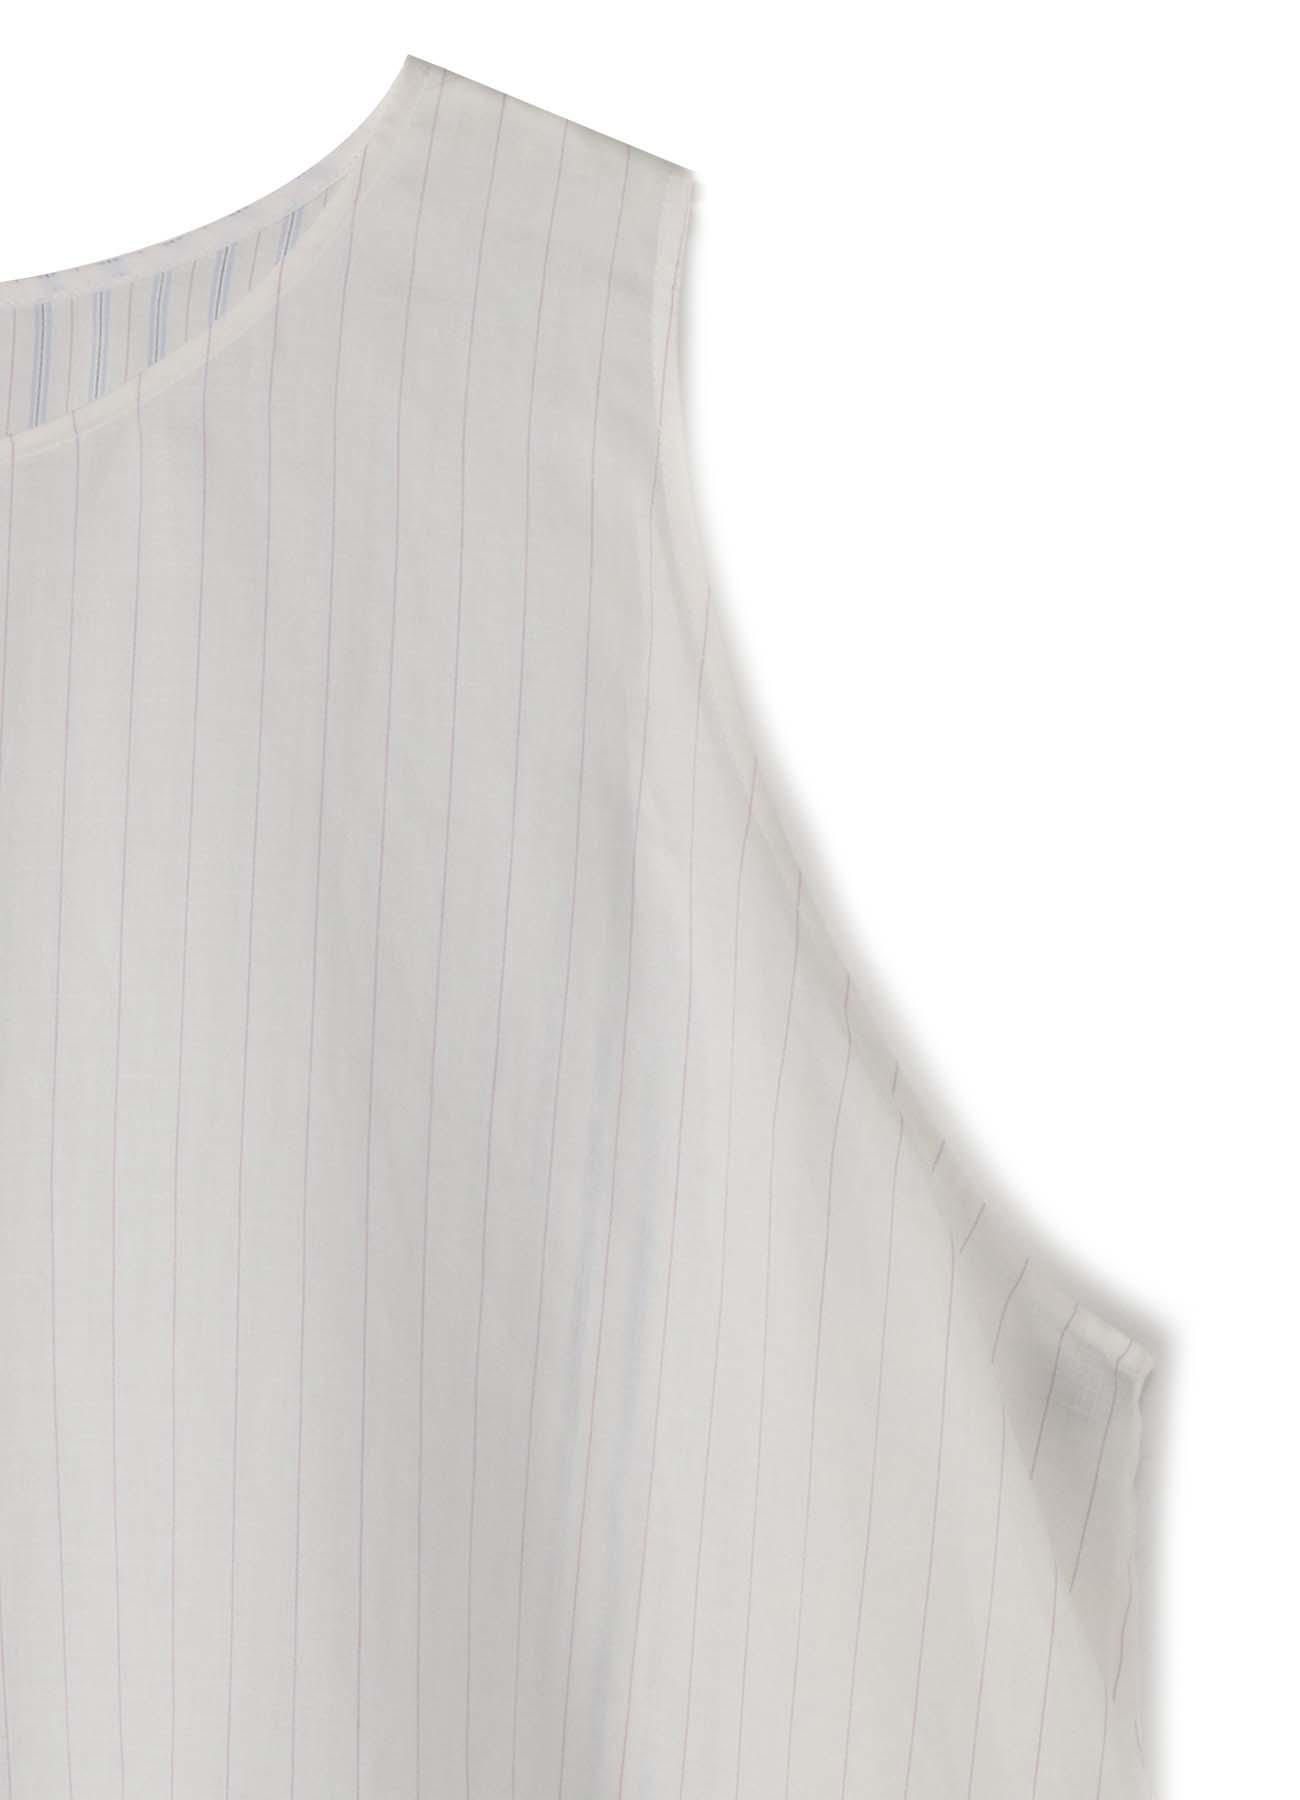 Rexel ie麻质感条纹右双无袖上衣